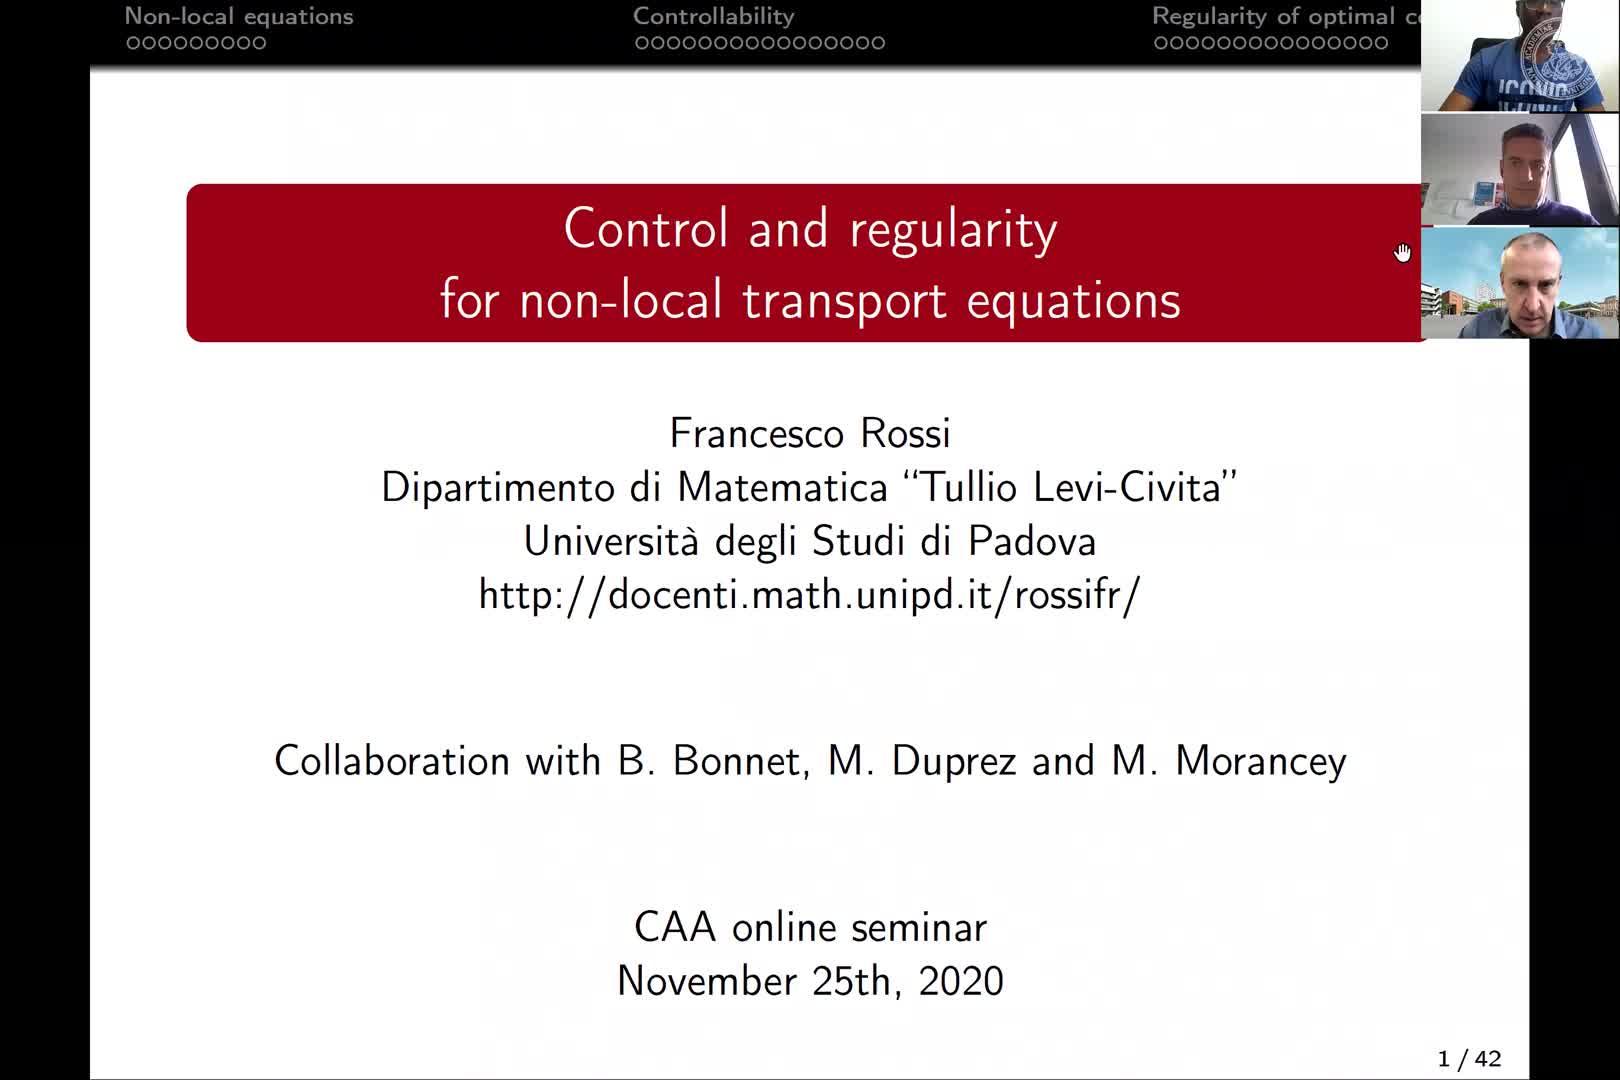 Control and regularity for non-local transport equations (Francesco Rossi, Università di Padova) preview image